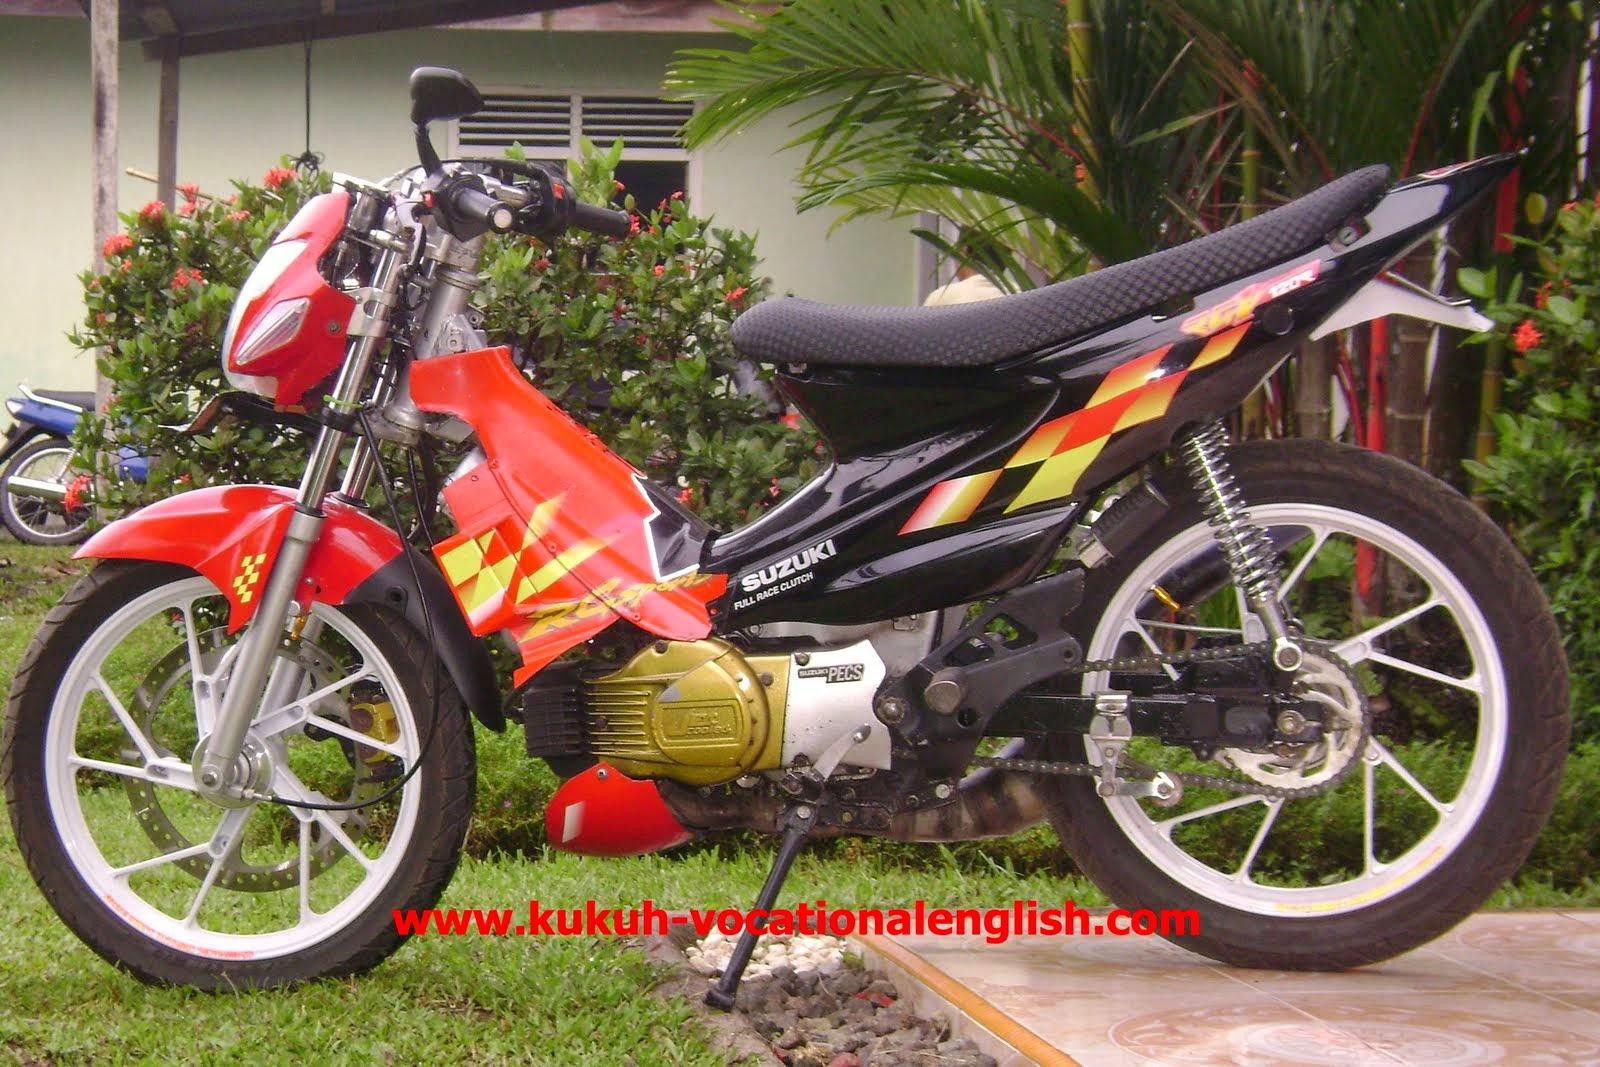 Modifikasi Motor Suzuki Kristal Wacana Modif Motor